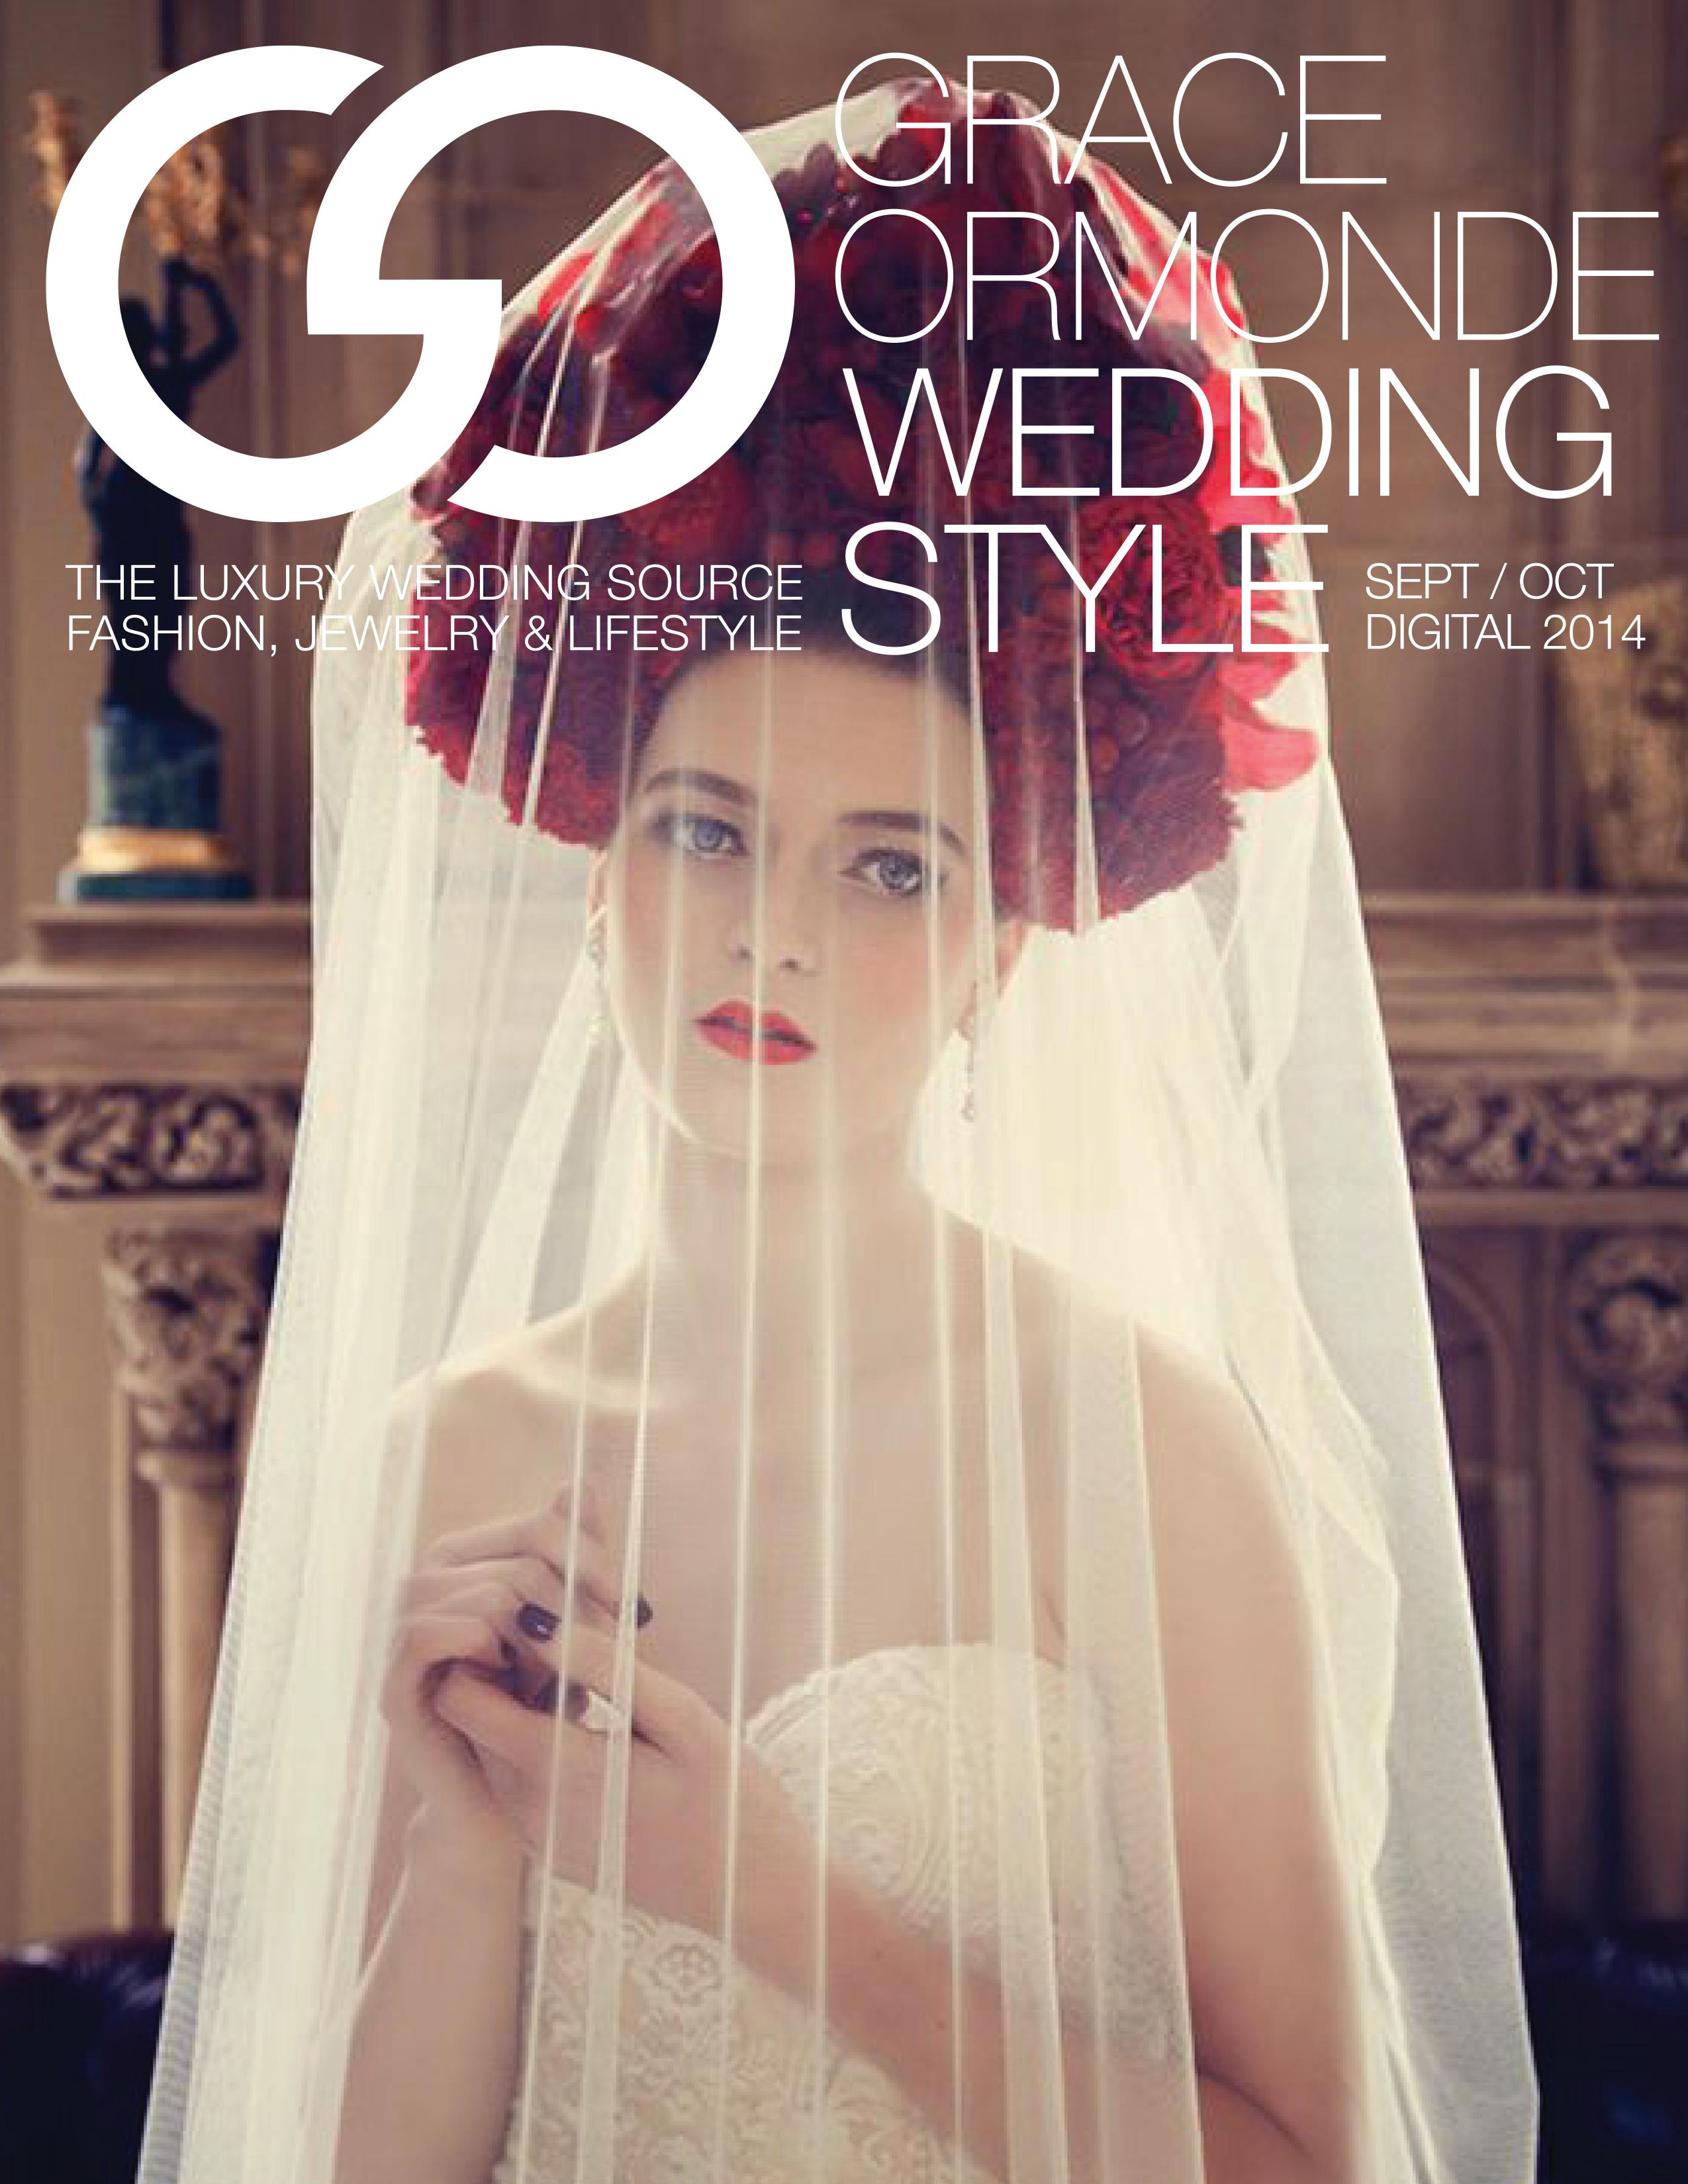 Image forGrace Ormonde Wedding Style, Sept/Oct 2014